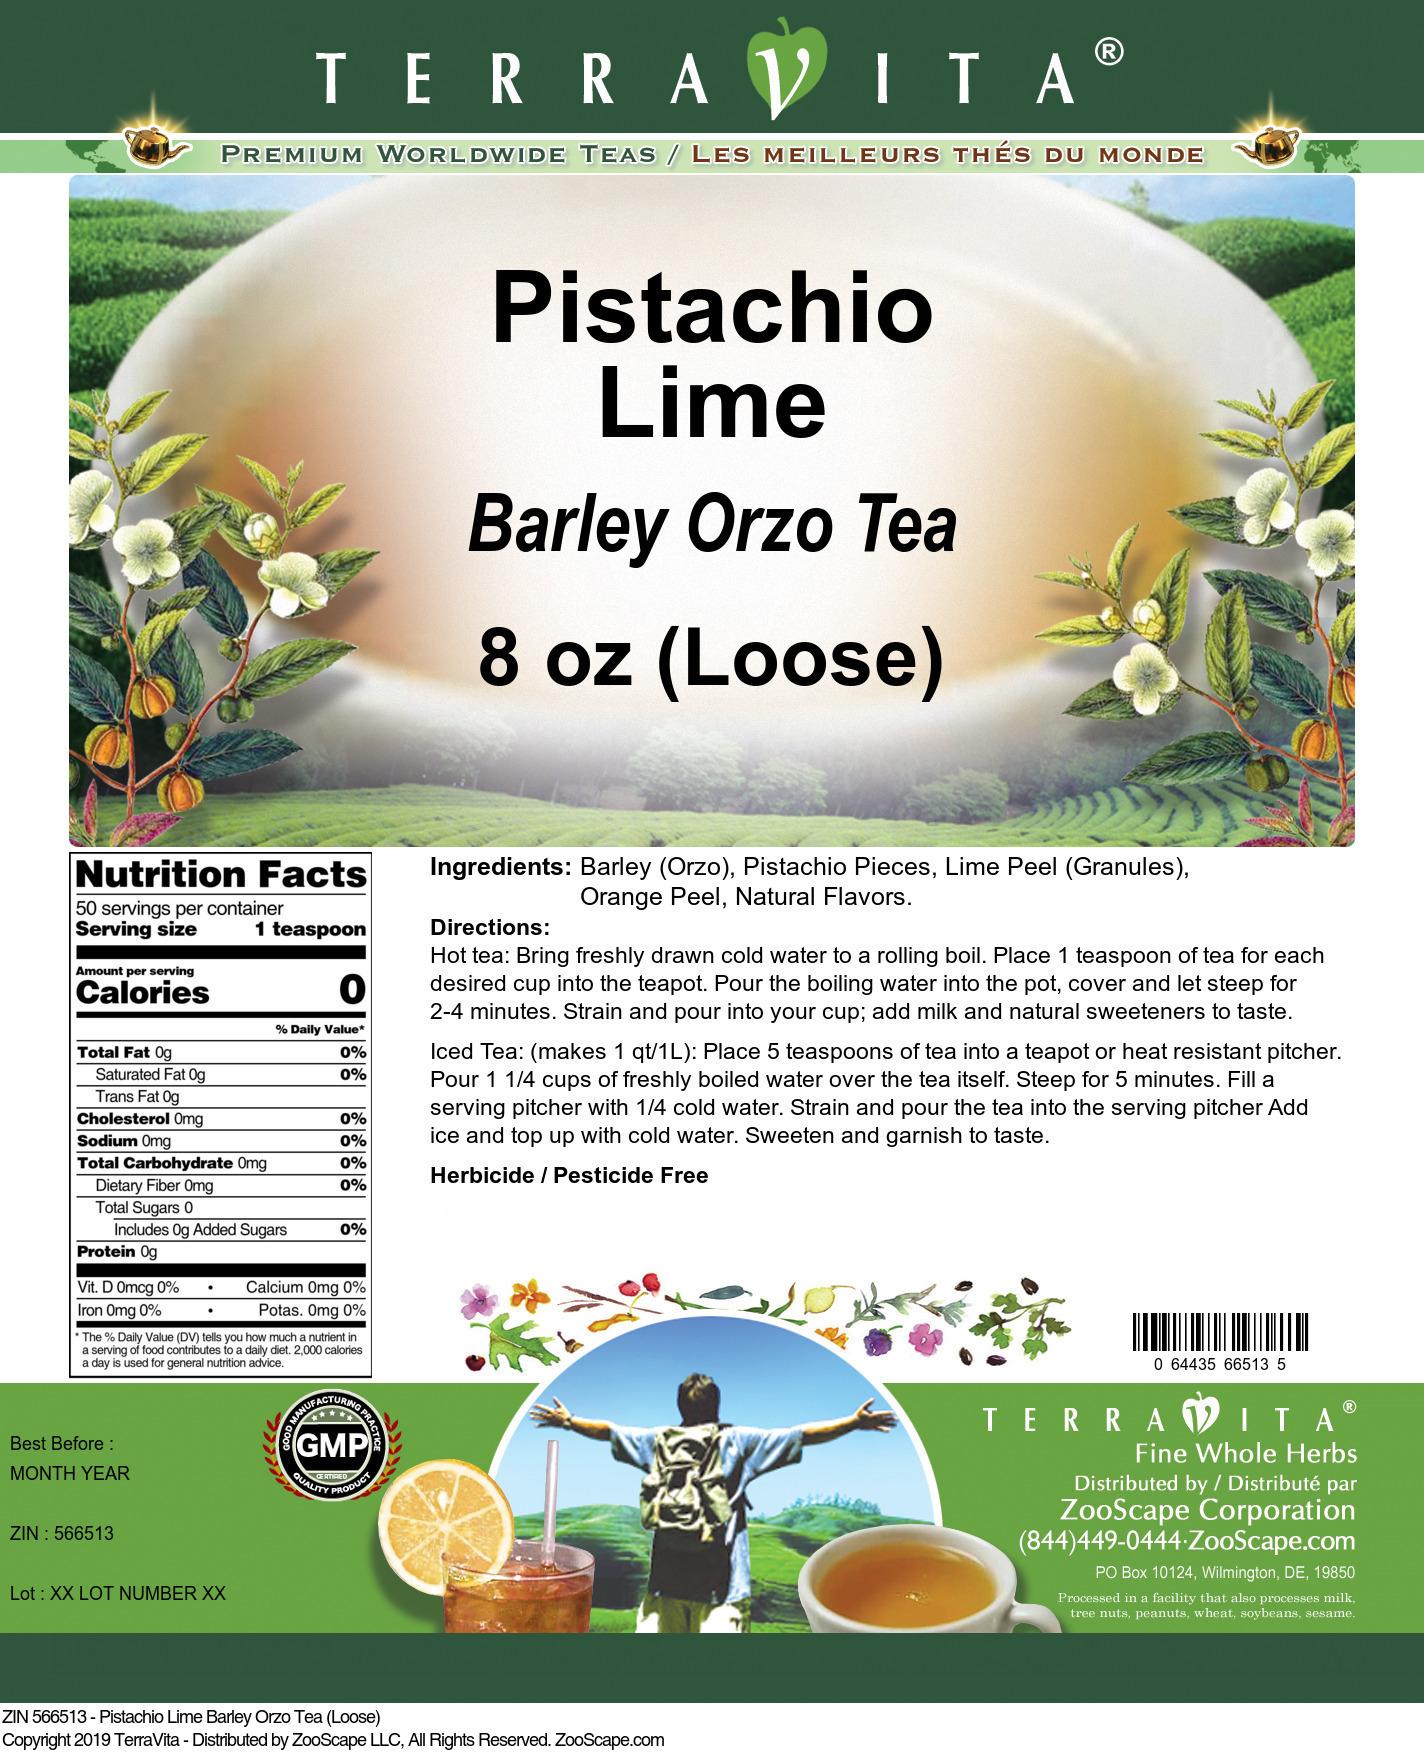 Pistachio Lime Barley Orzo Tea (Loose)